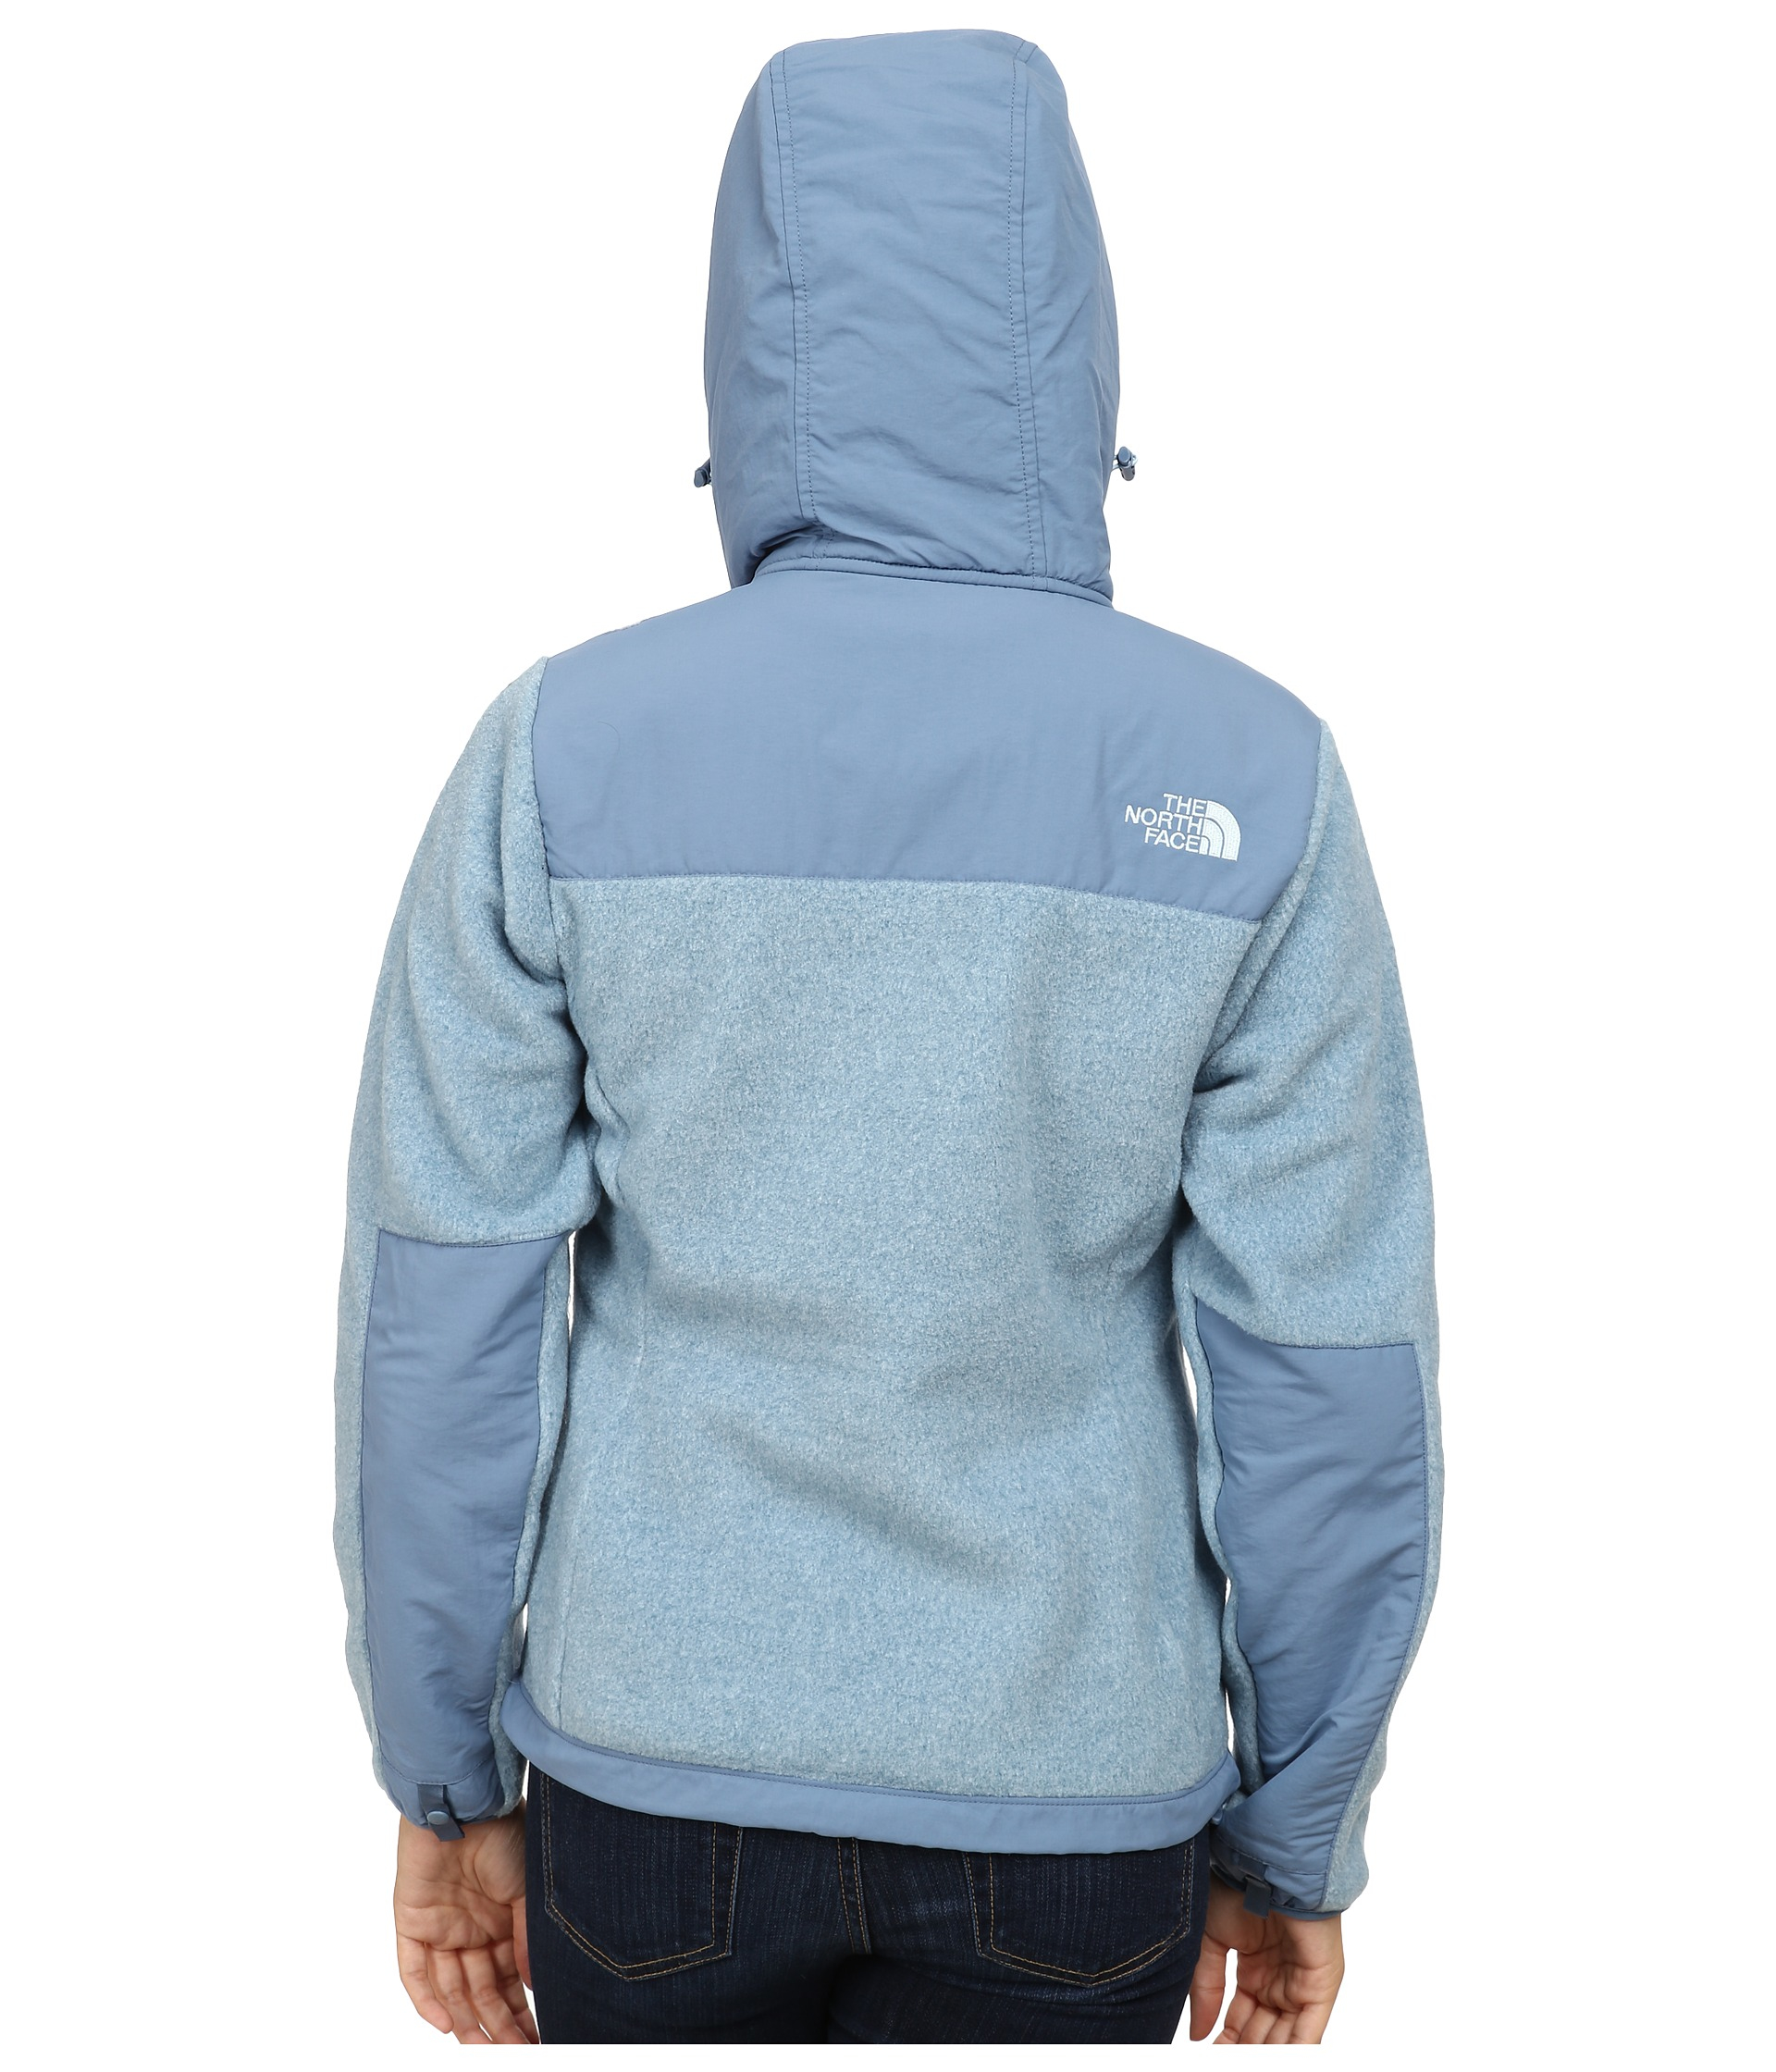 North Face Denali Hoodie Womens Blue 58